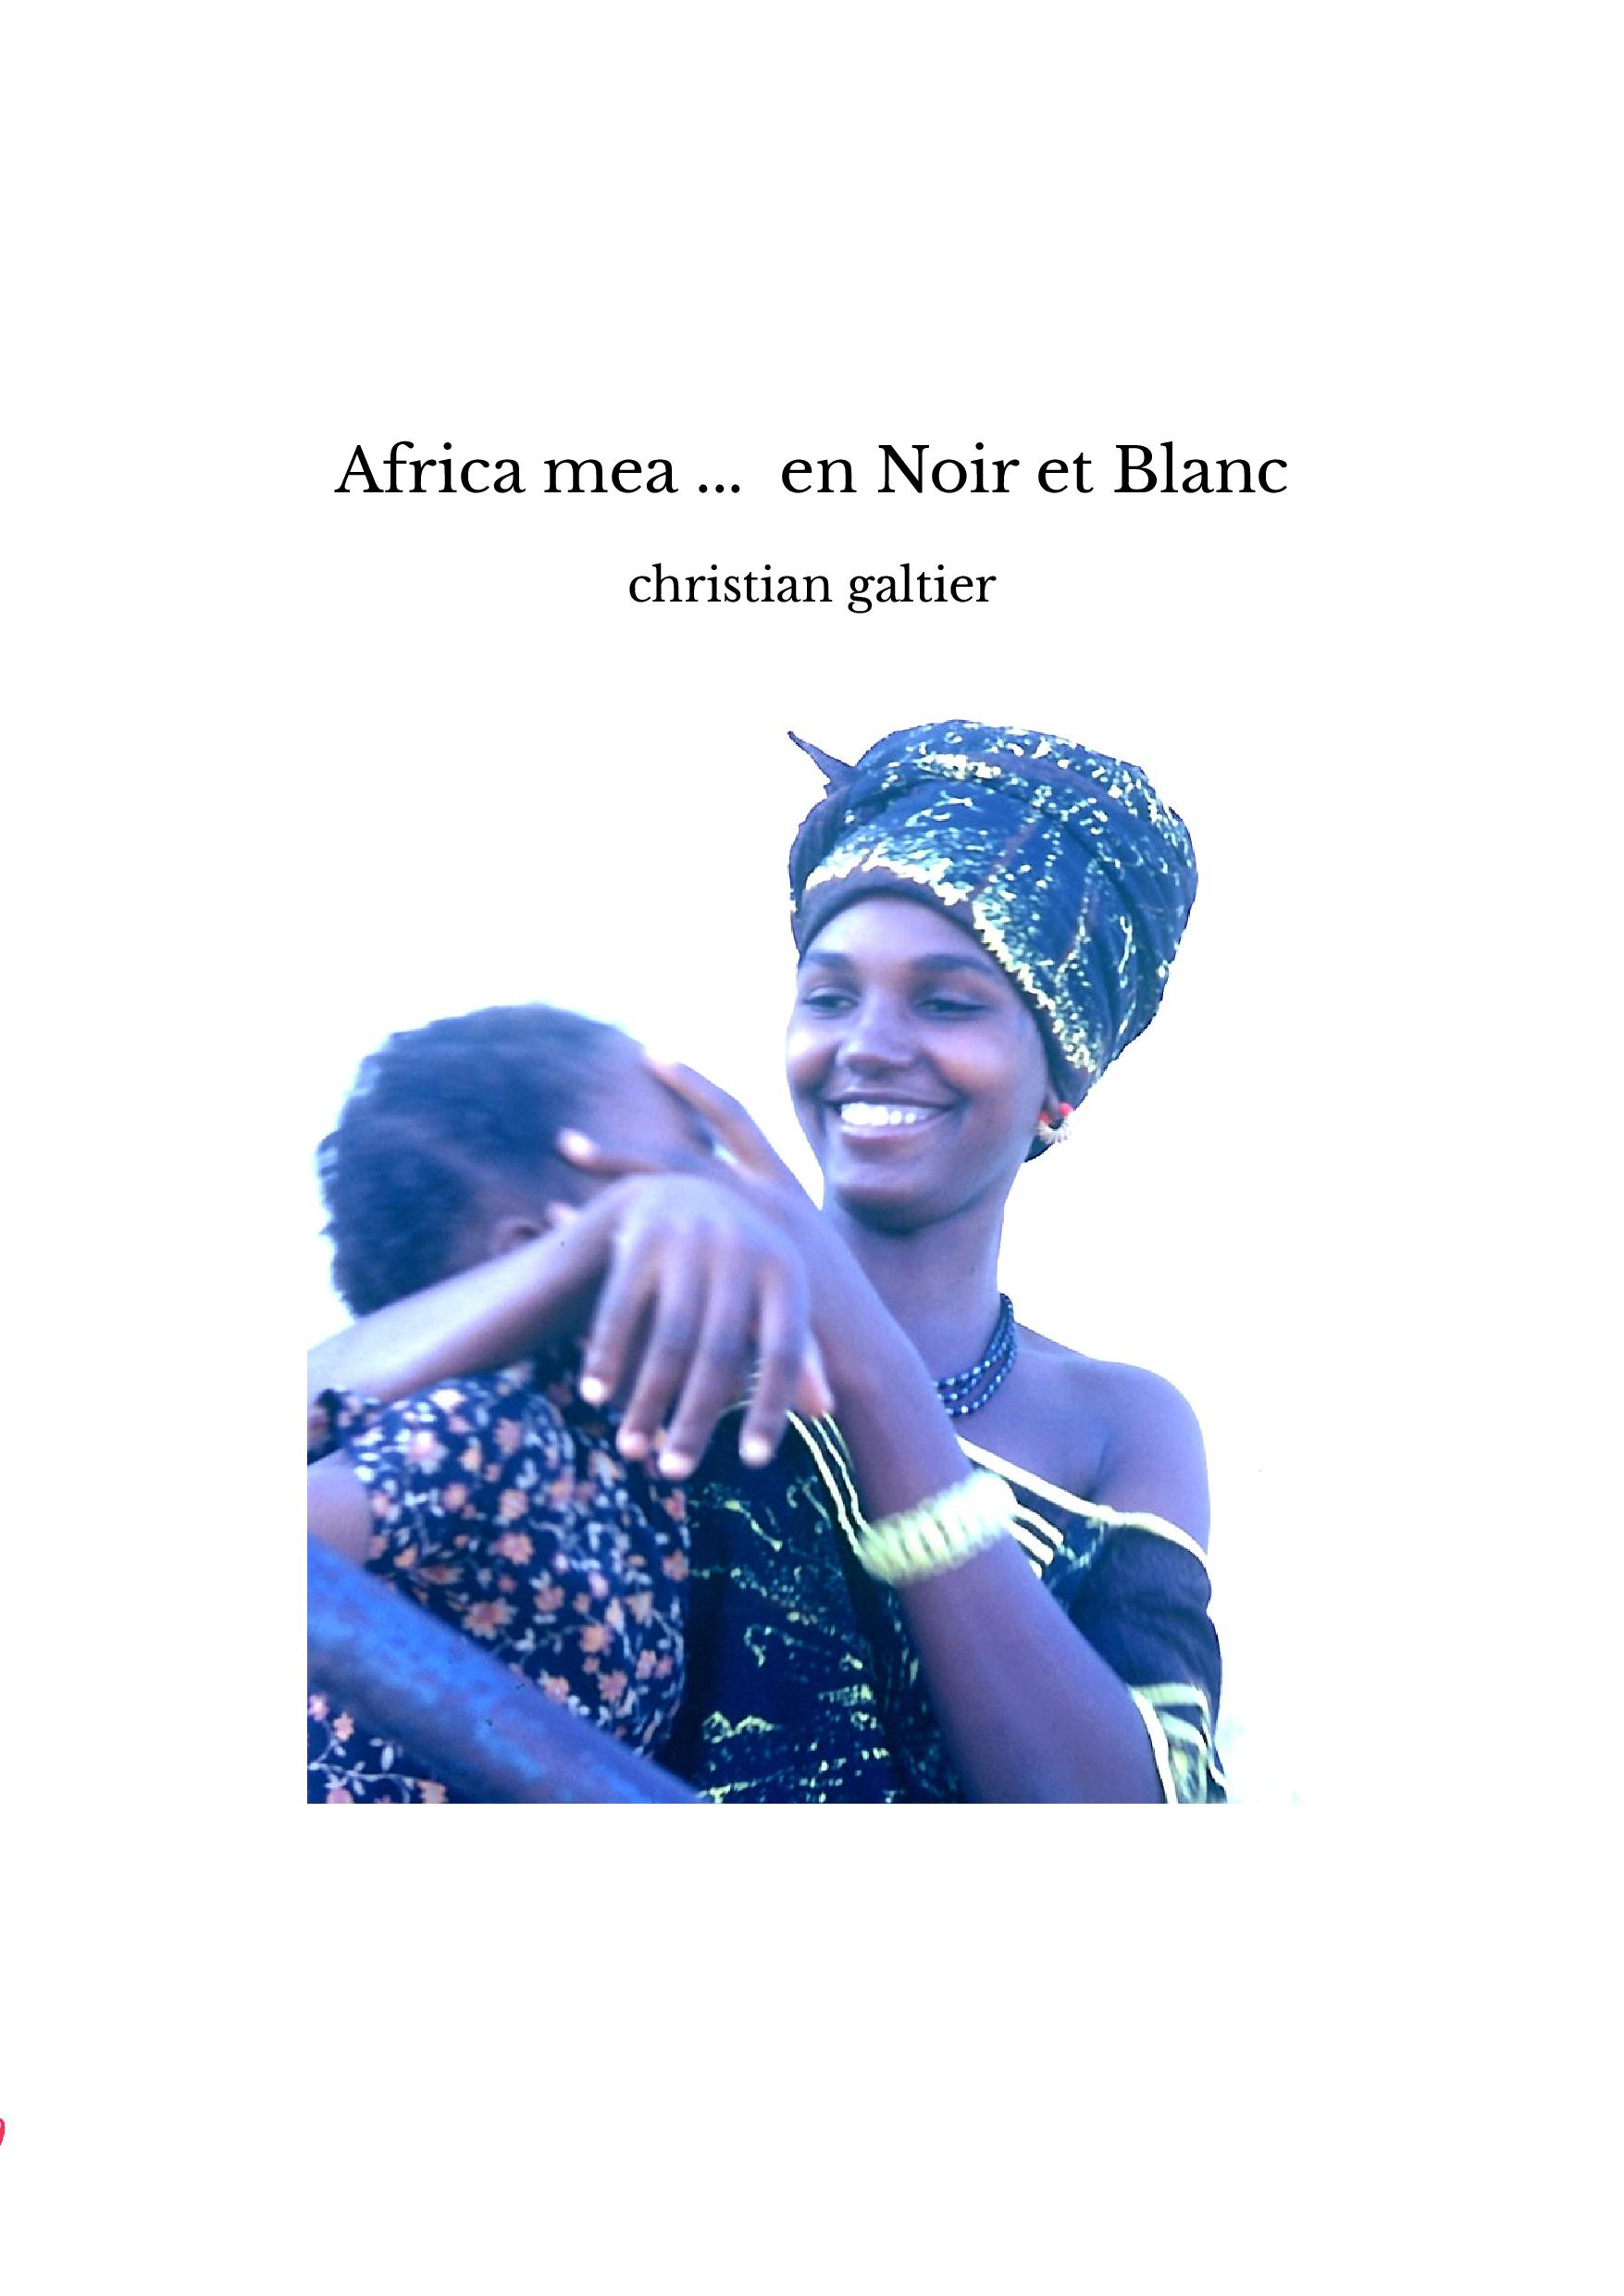 Africa mea ... en Noir et Blanc